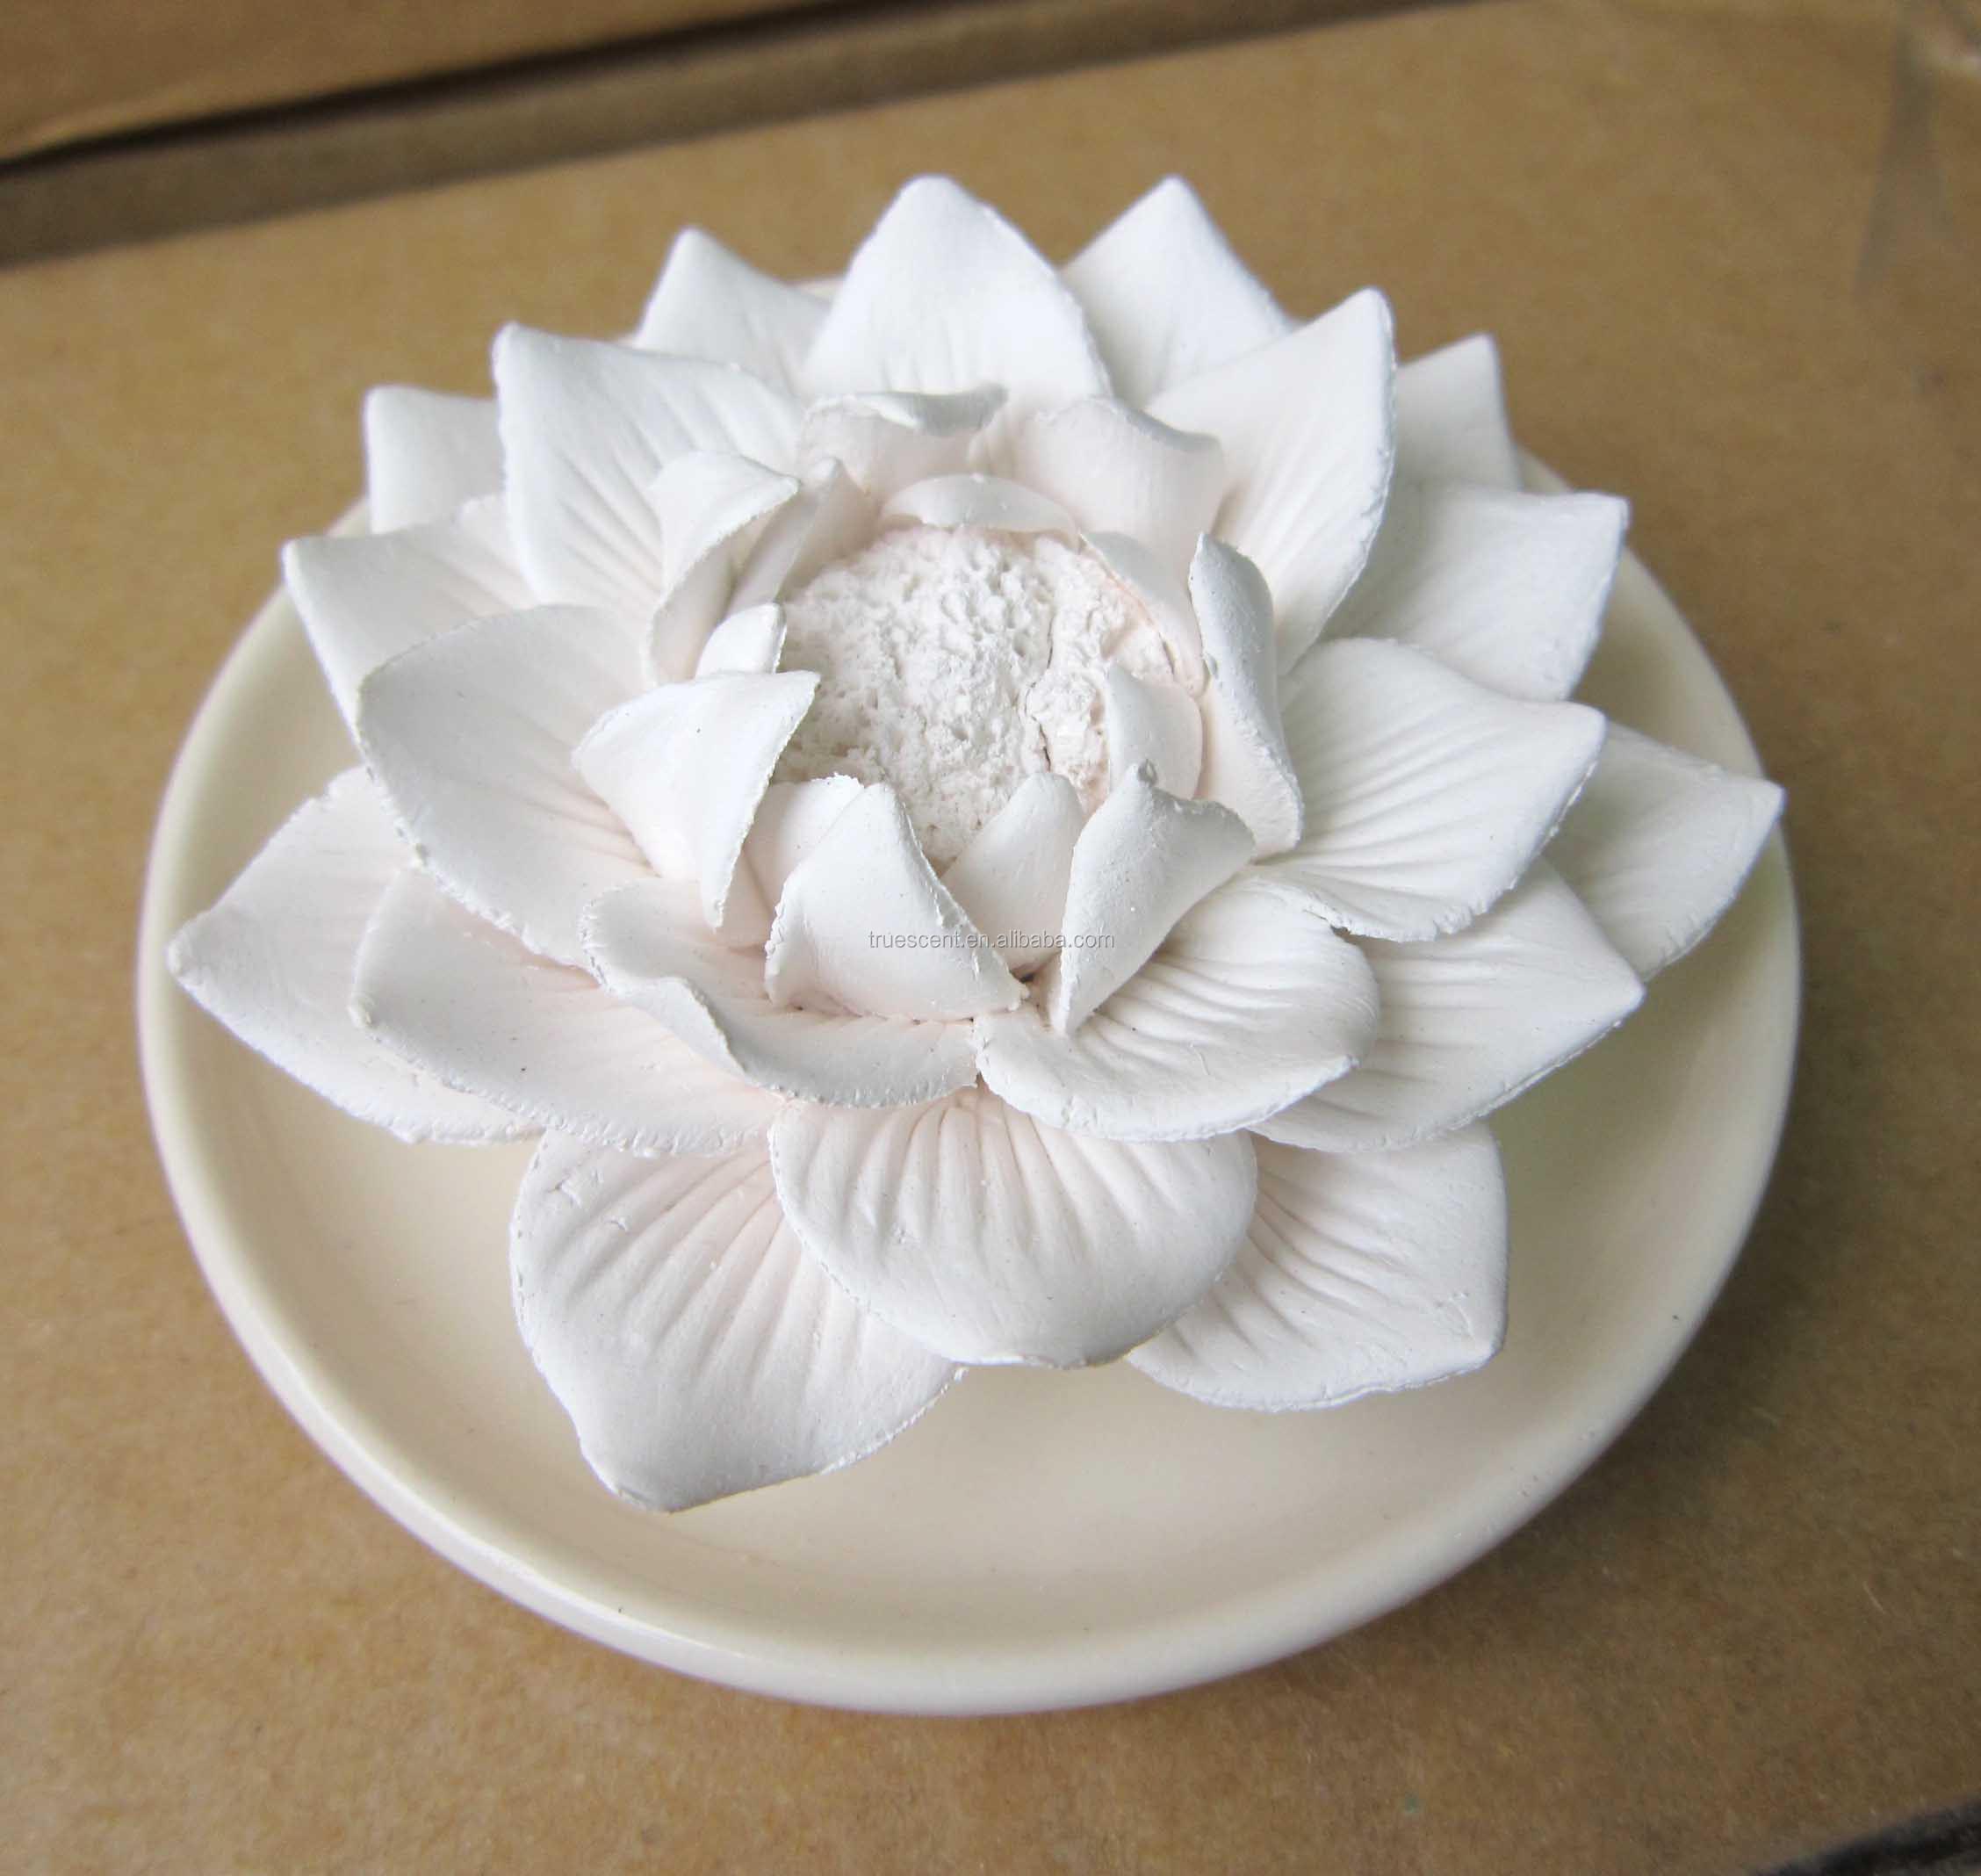 Handmade Scented Rose Flower Ceramic Stone Oil Diffuser